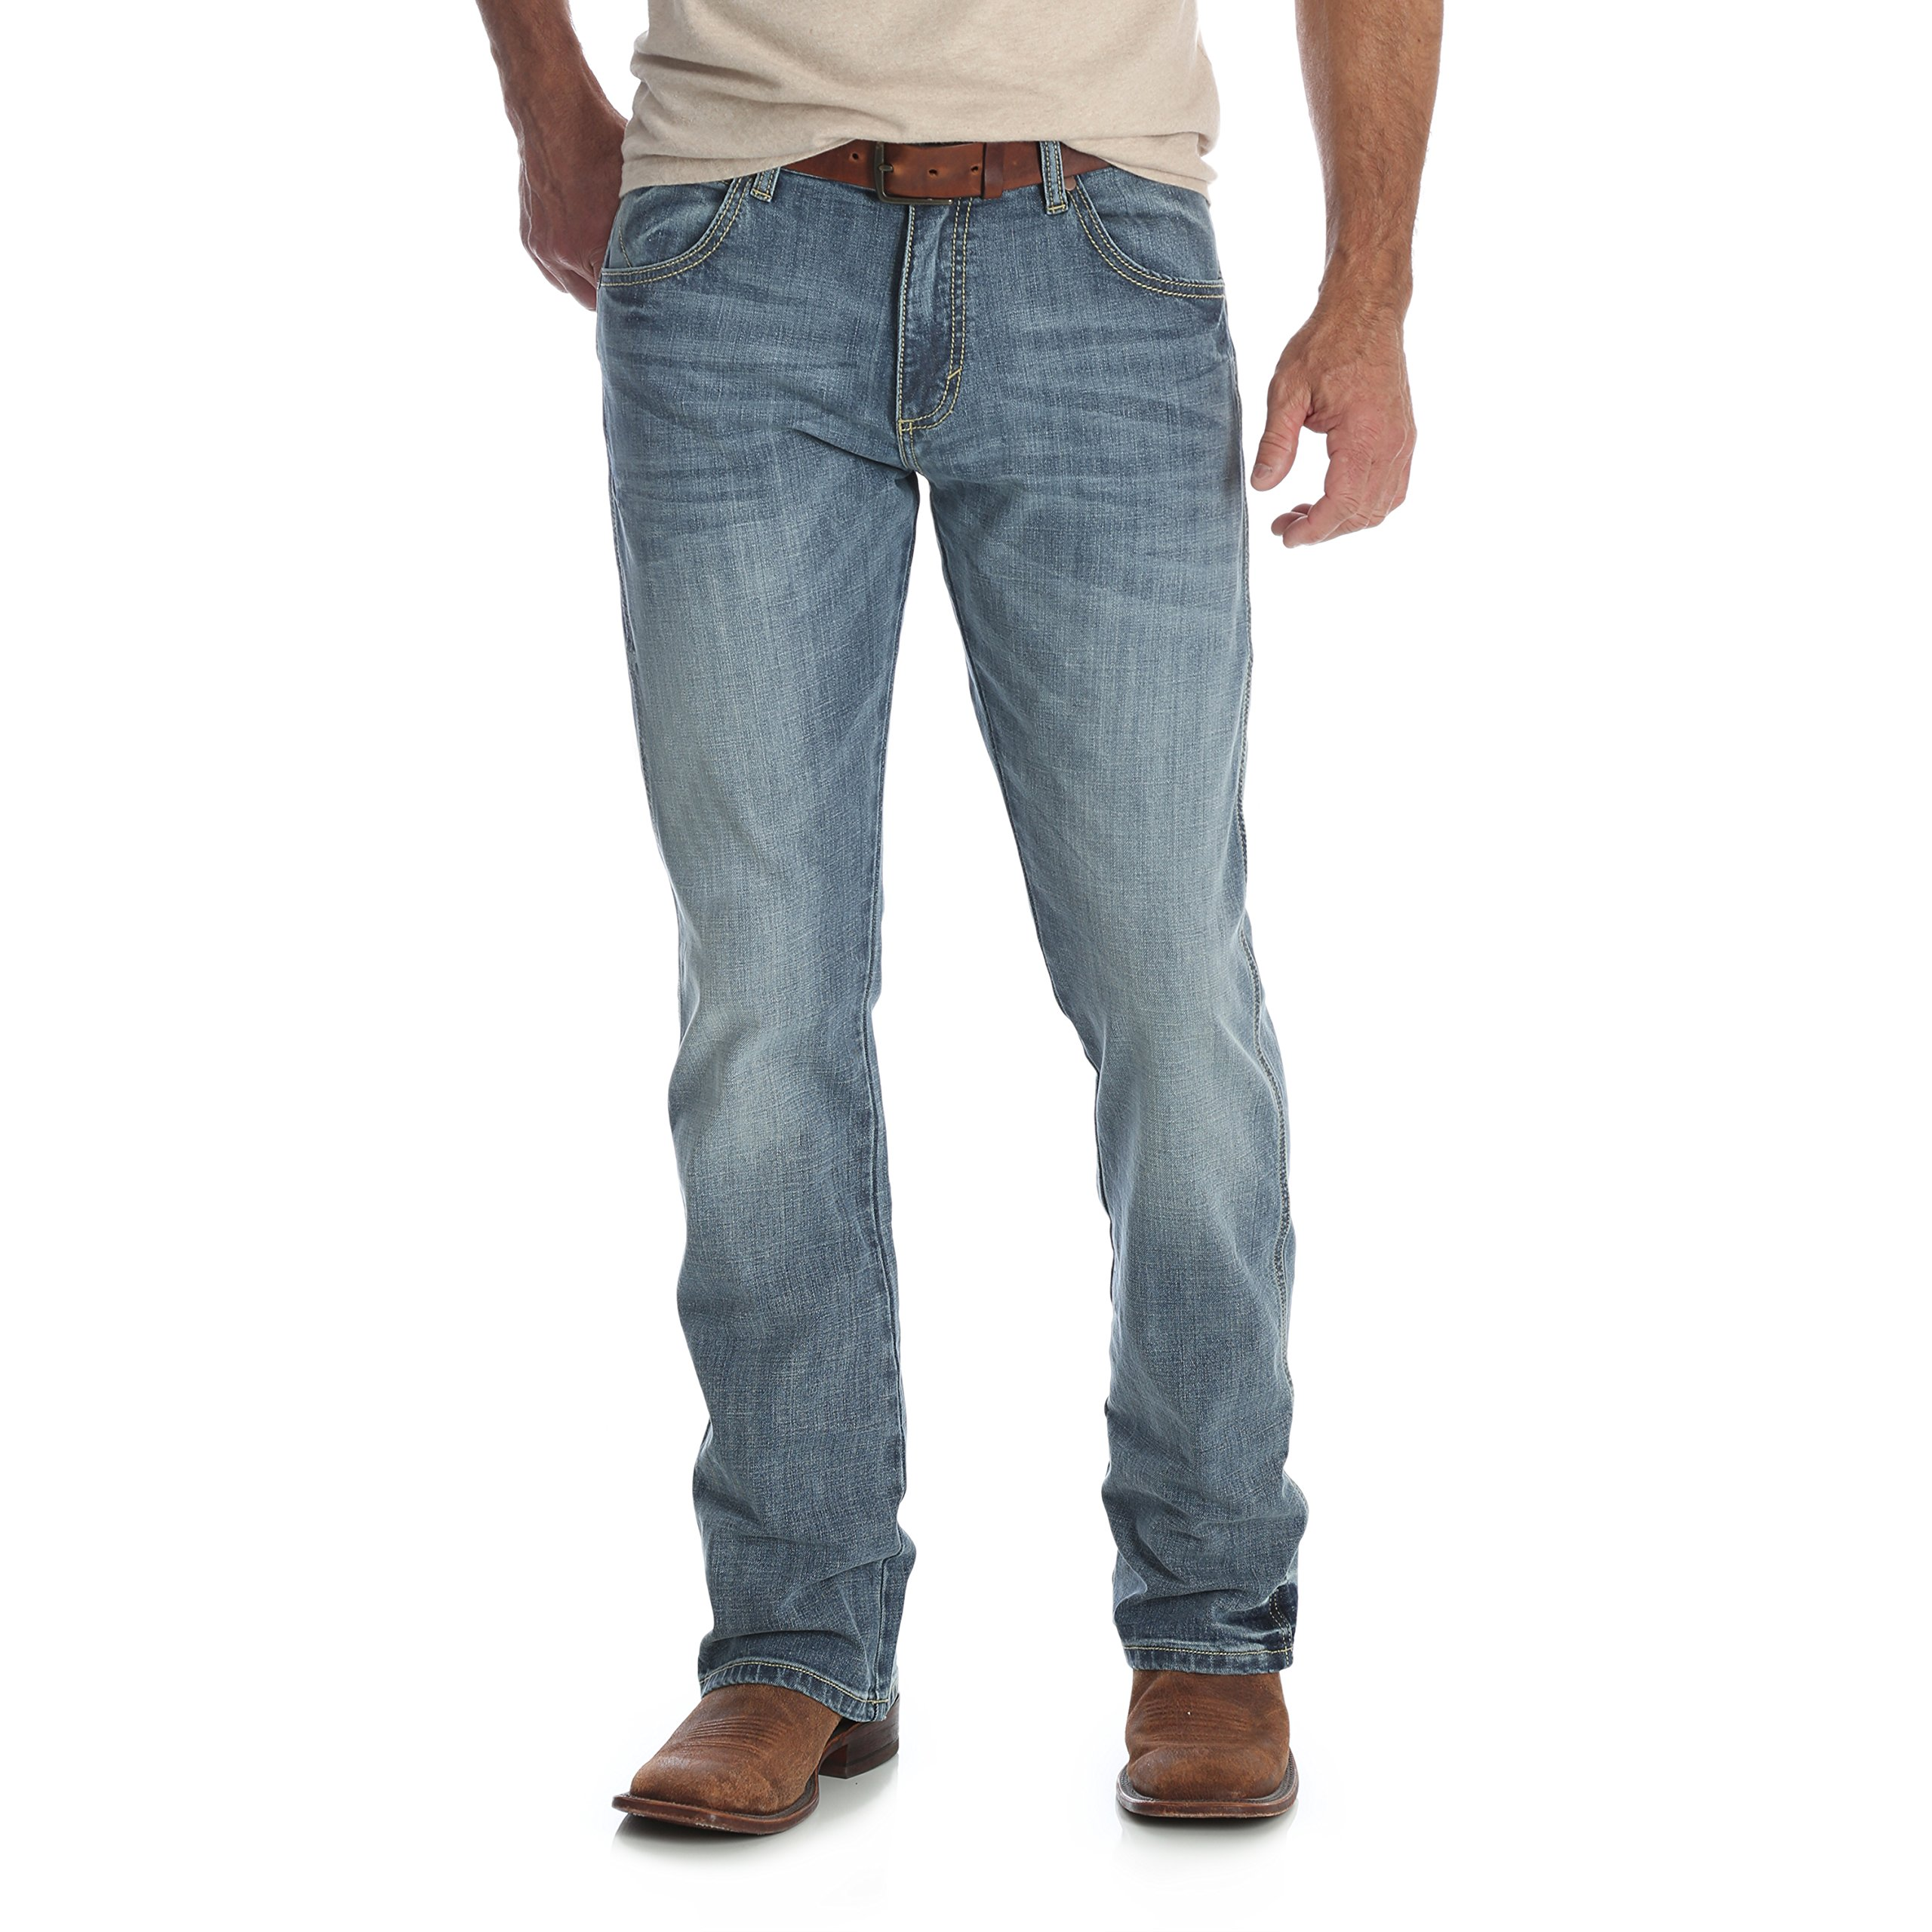 Wrangler Men's Retro Slim Fit Boot Cut Jean, Greeley, 36X32